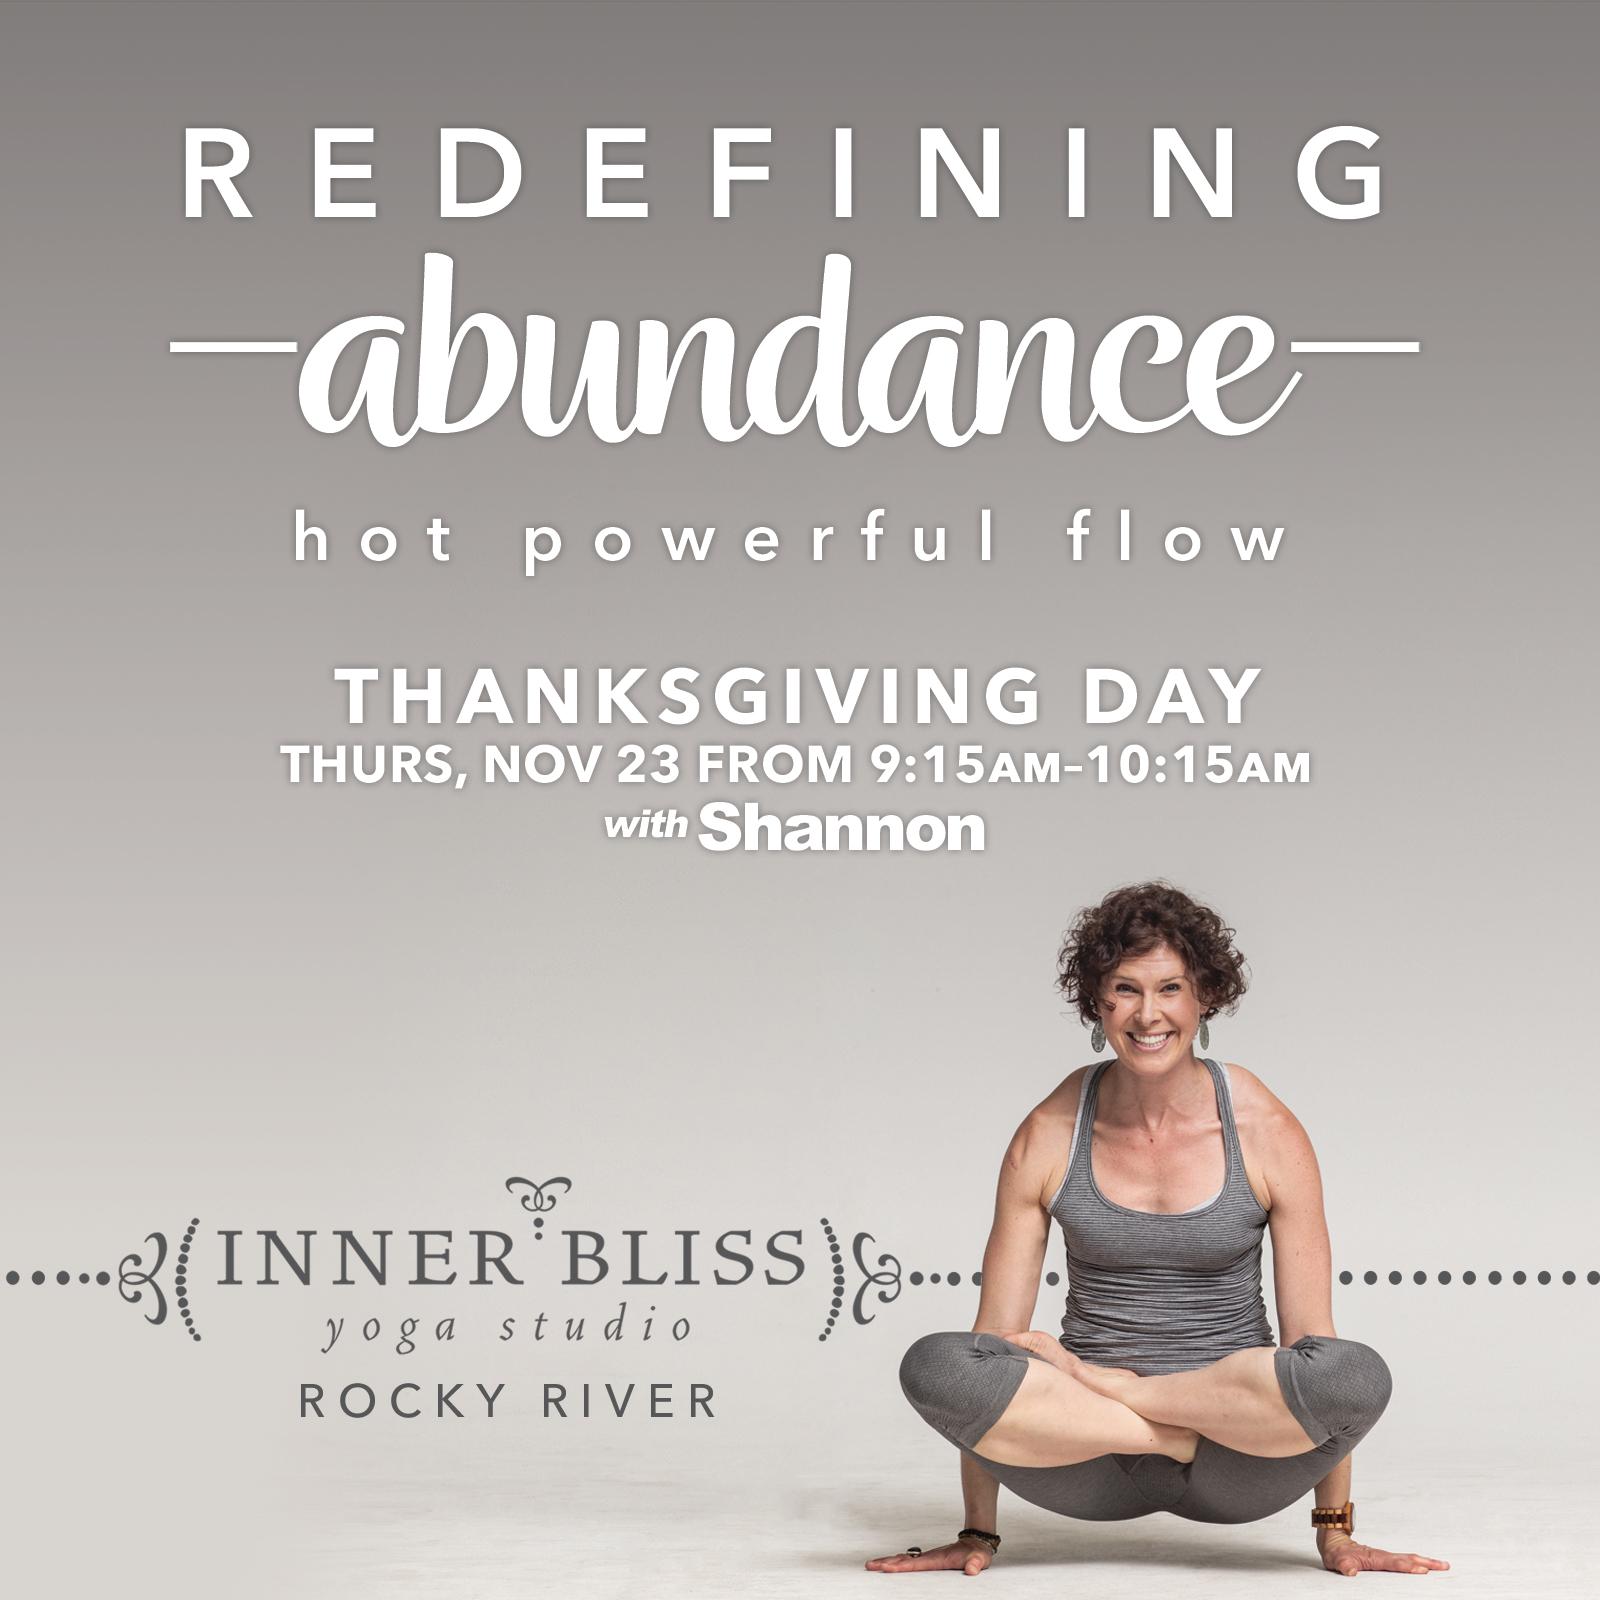 iby-redefining-abundance.jpg